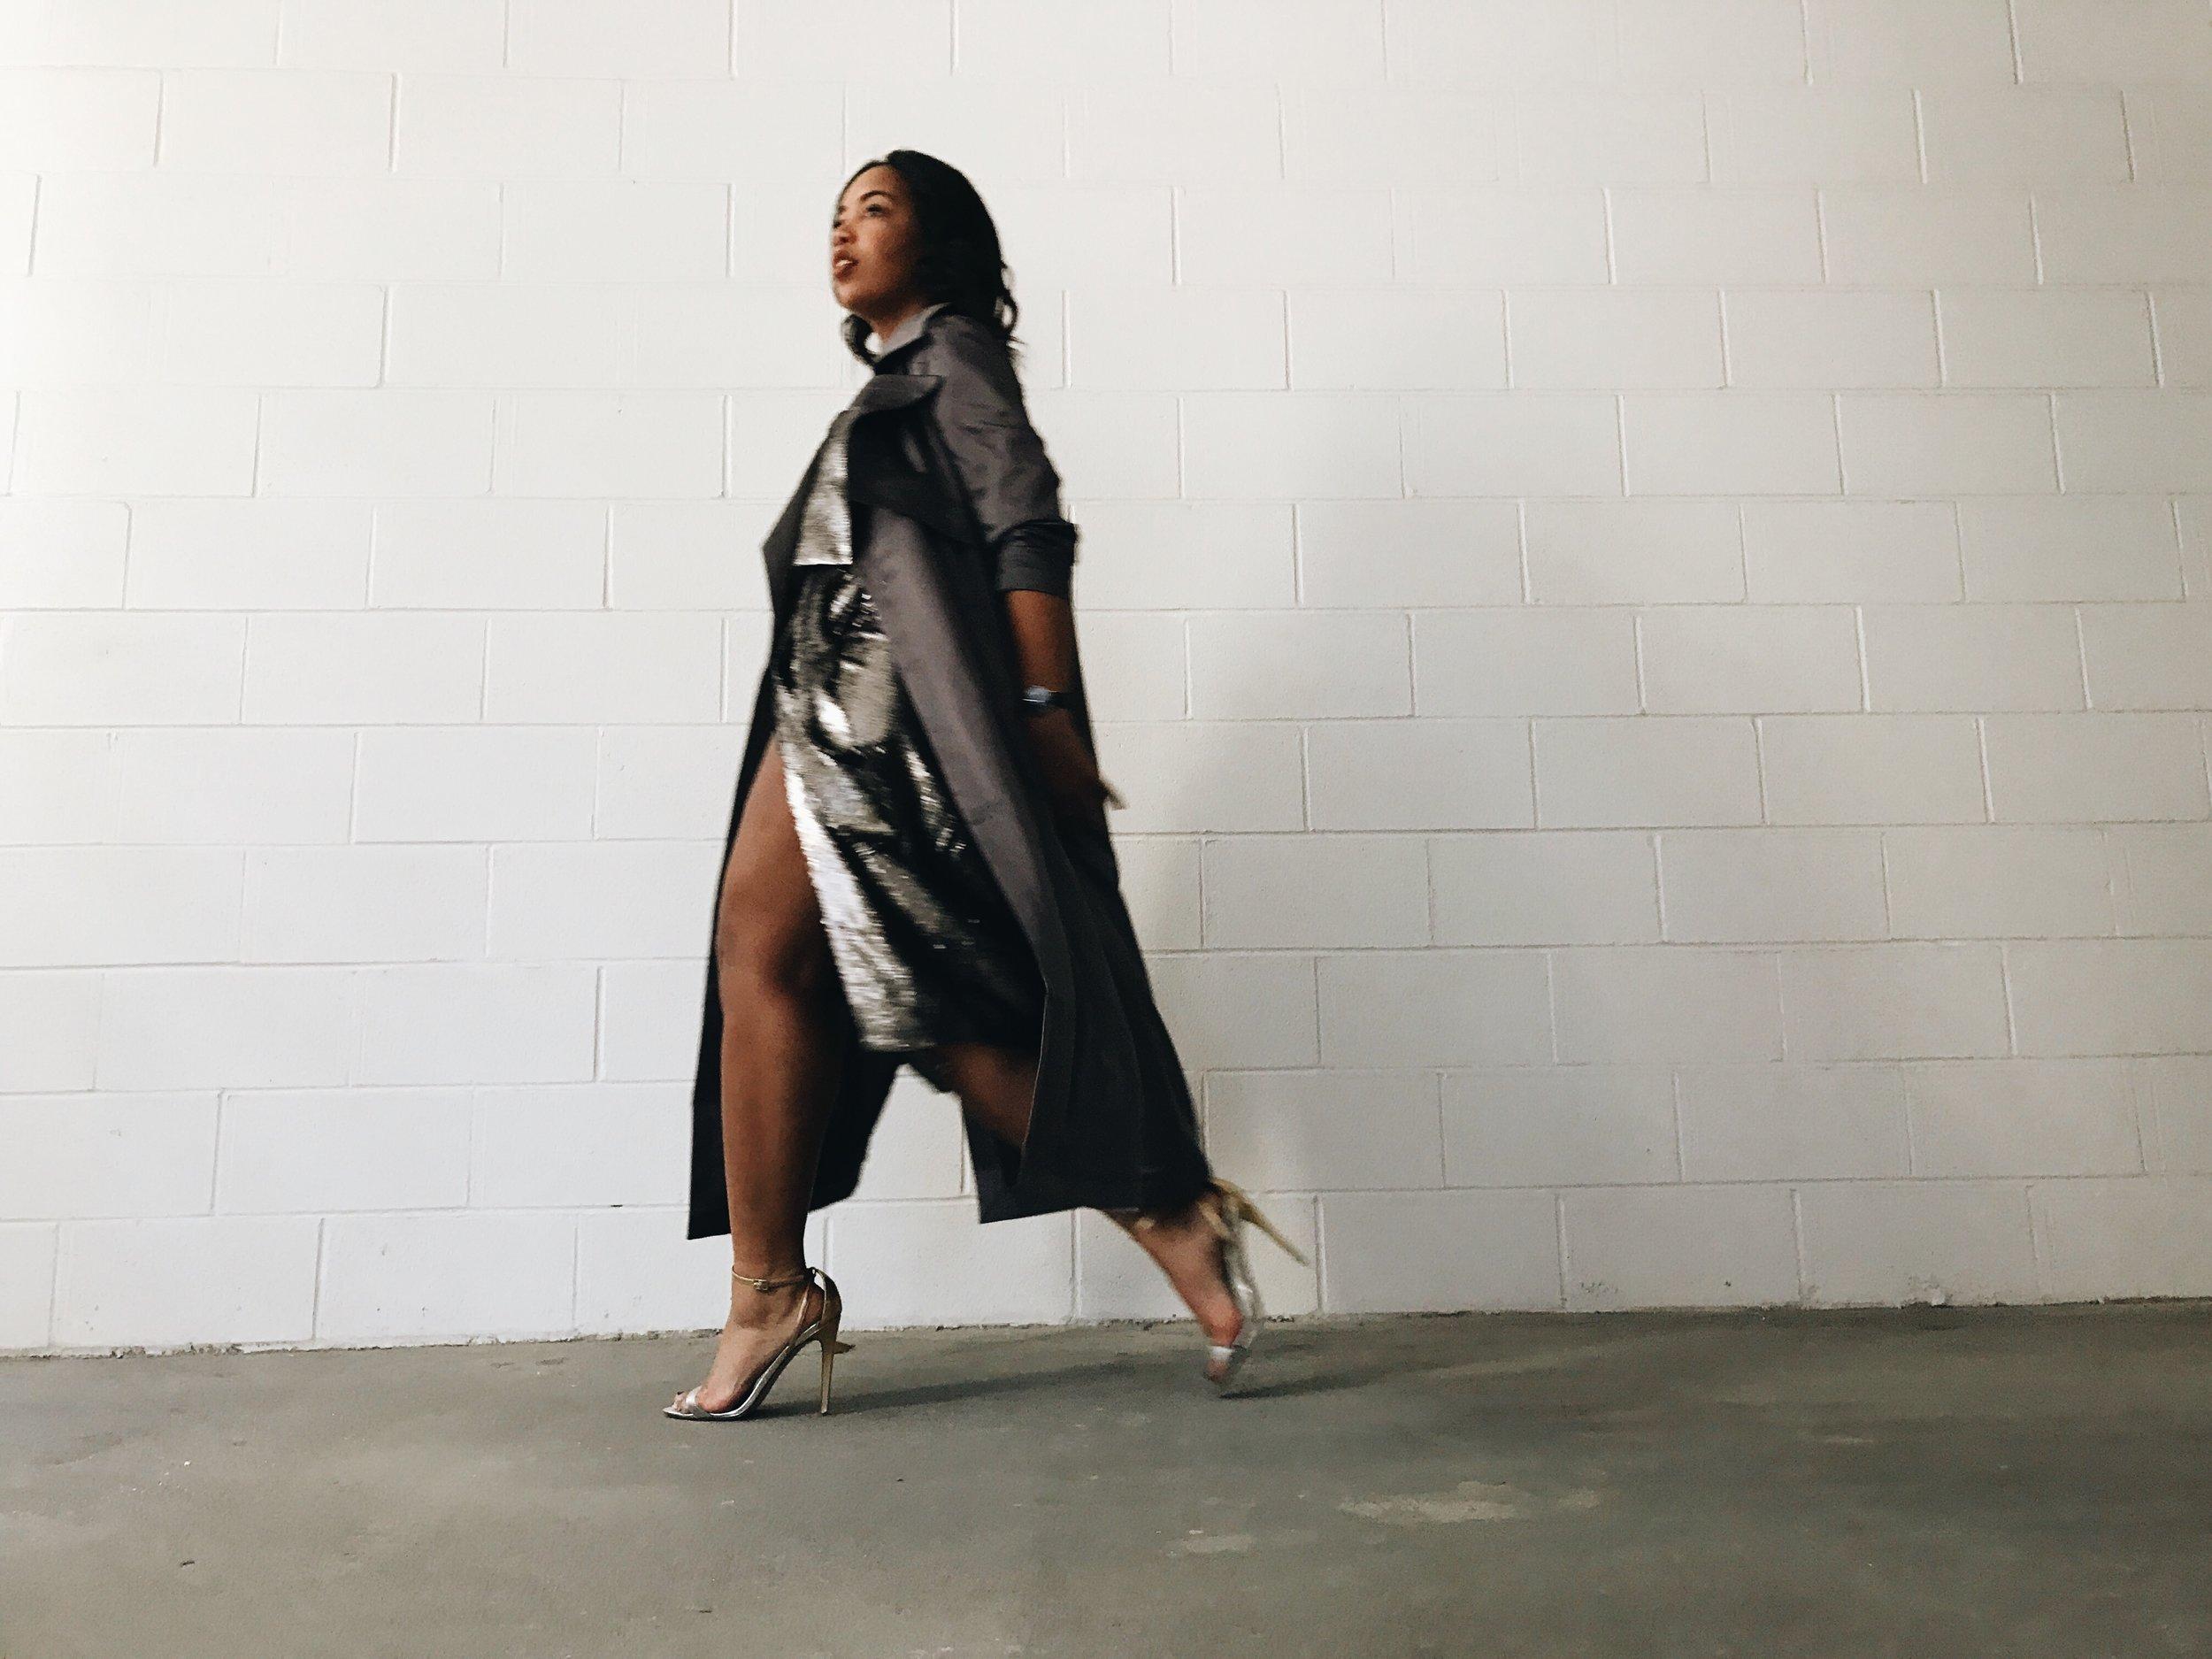 8-Lavish-Alice-Sequin-Dress-ASOS-Satin-Trench-Coat-Metallic-Heels-NYE-outfit.jpg